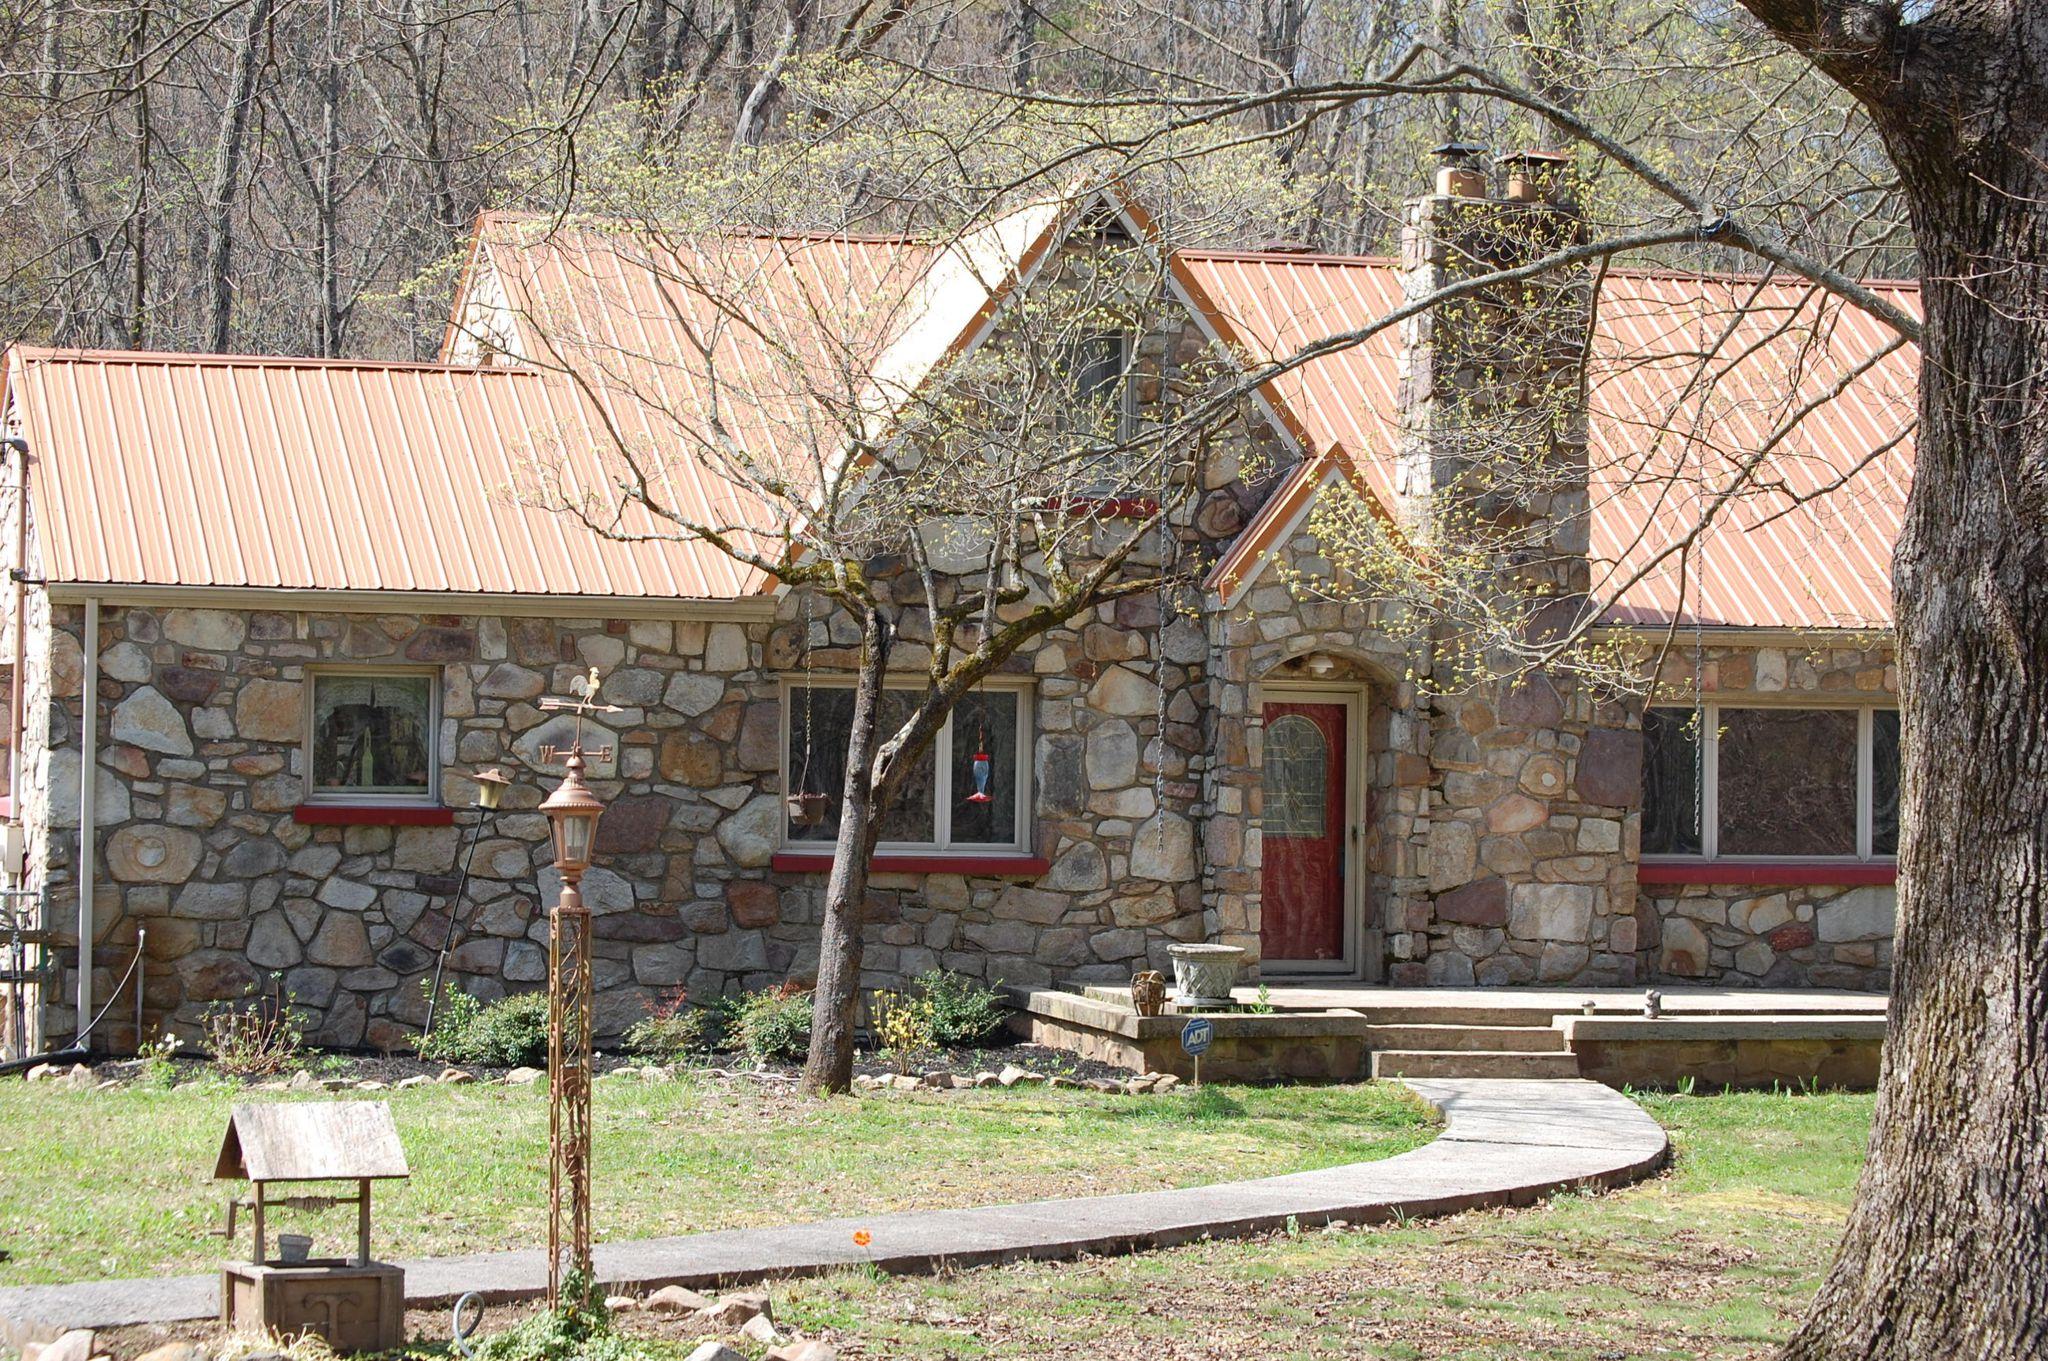 947 Goose Creek Rd, Seymour, TN 37865 - 2 Bath Single-Family